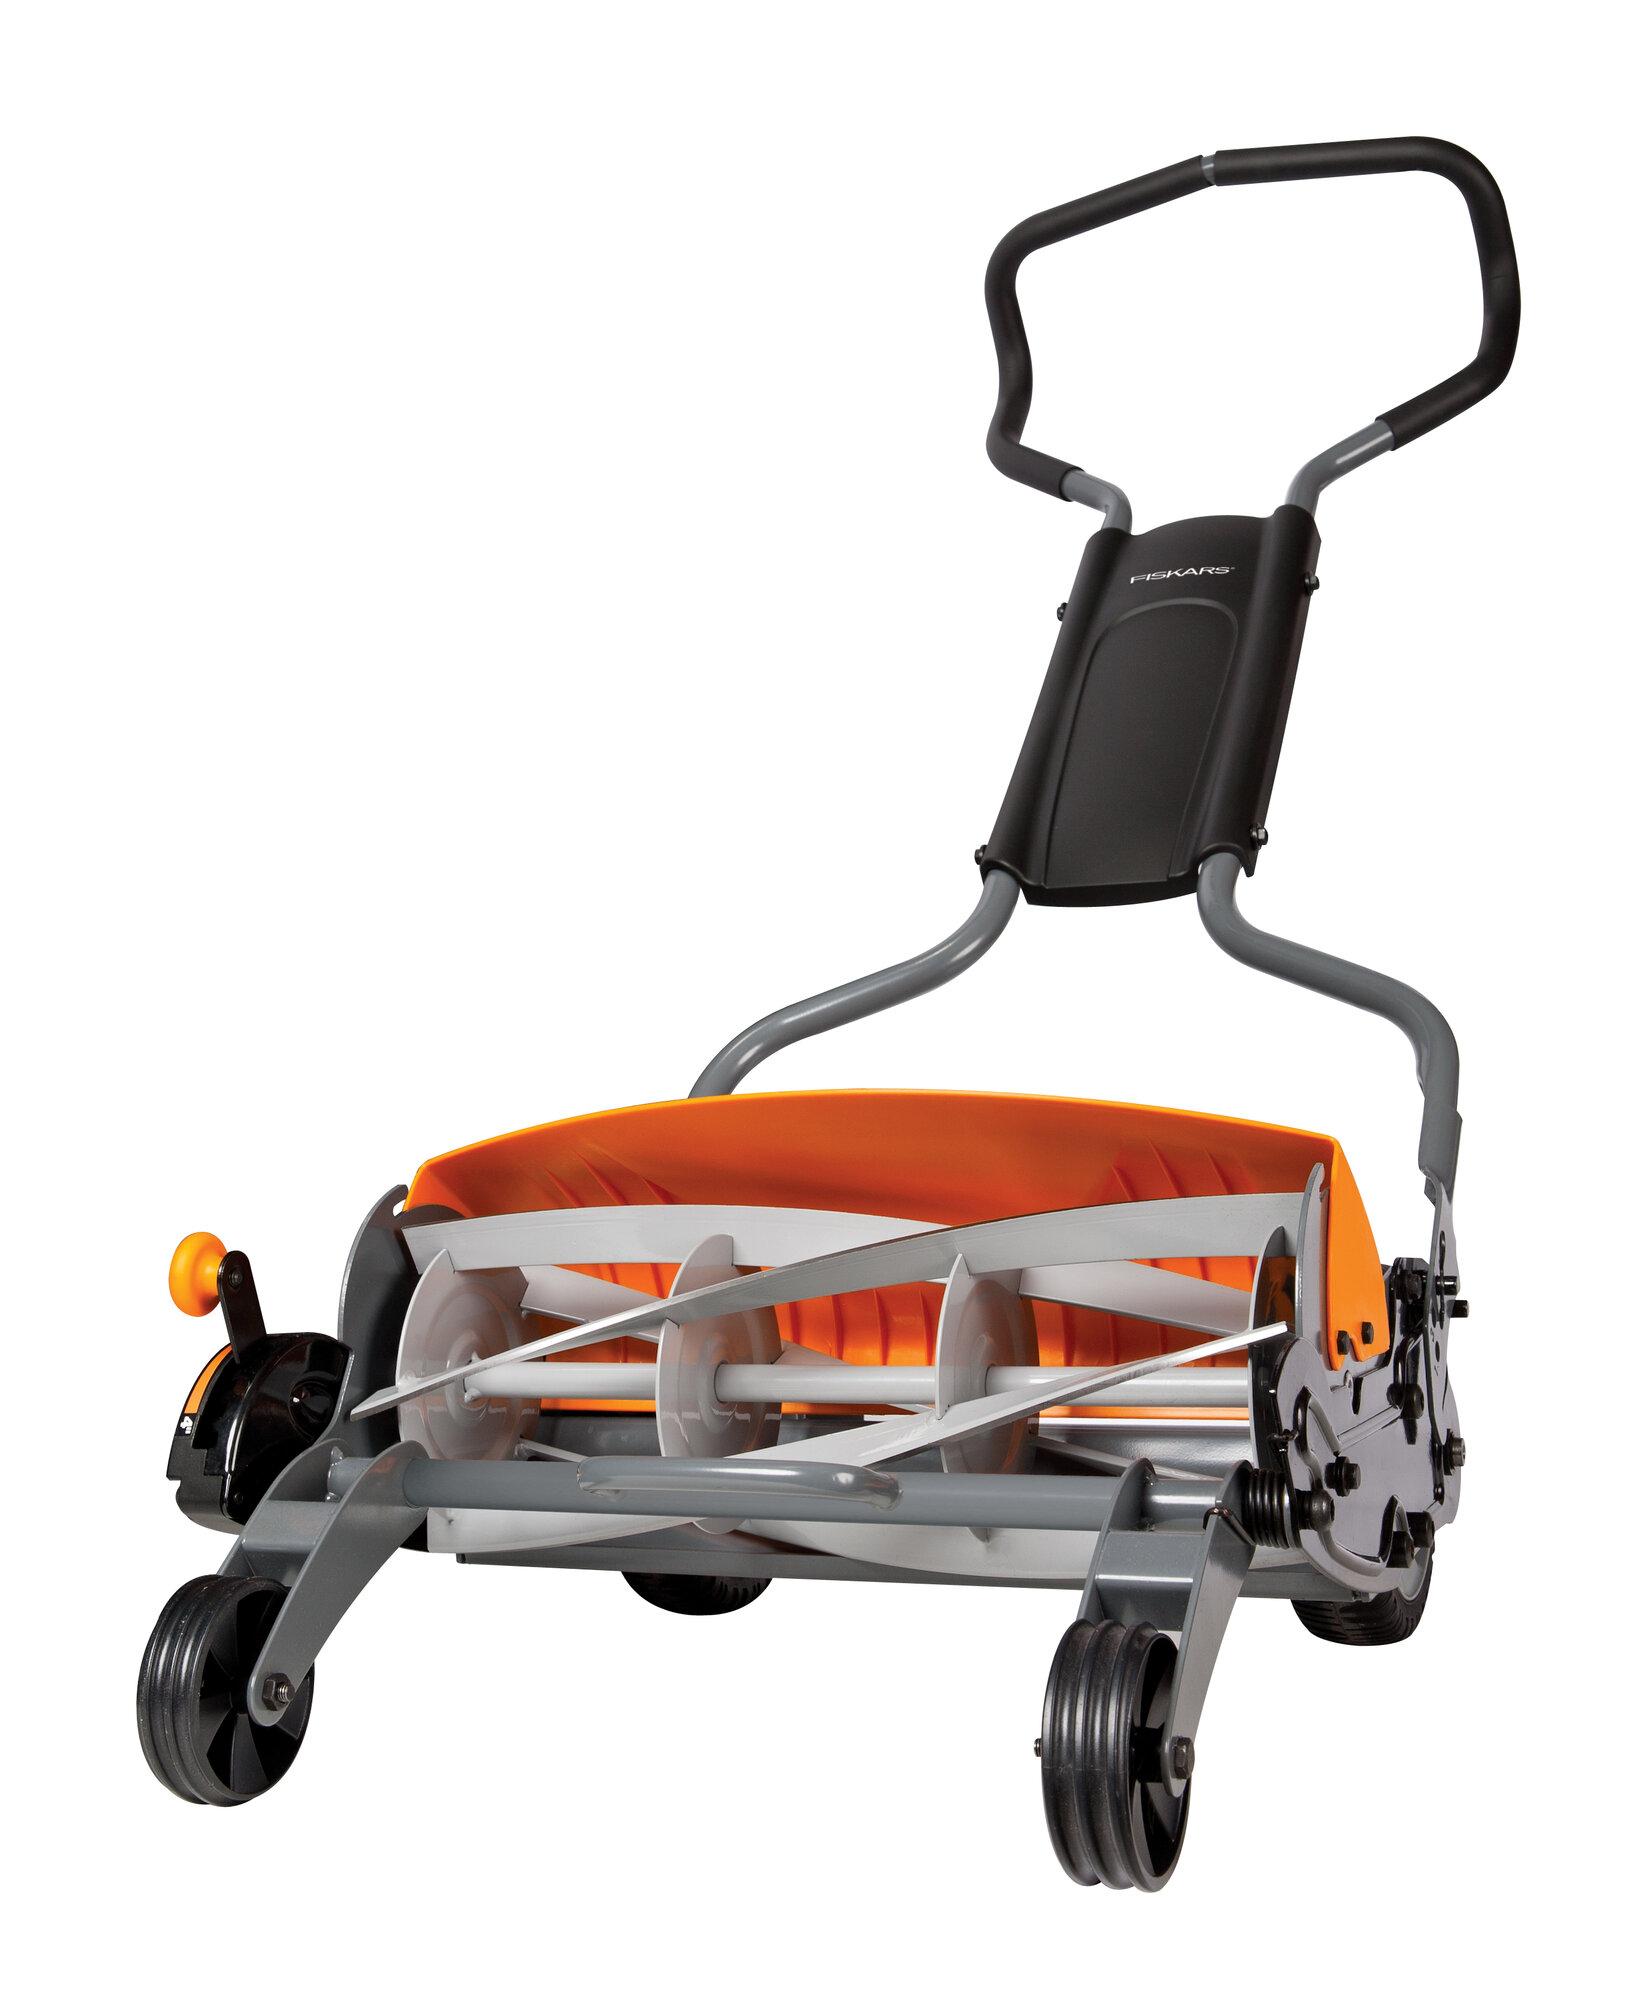 fiskars 18 staysharp max push reel lawn mower ebay. Black Bedroom Furniture Sets. Home Design Ideas